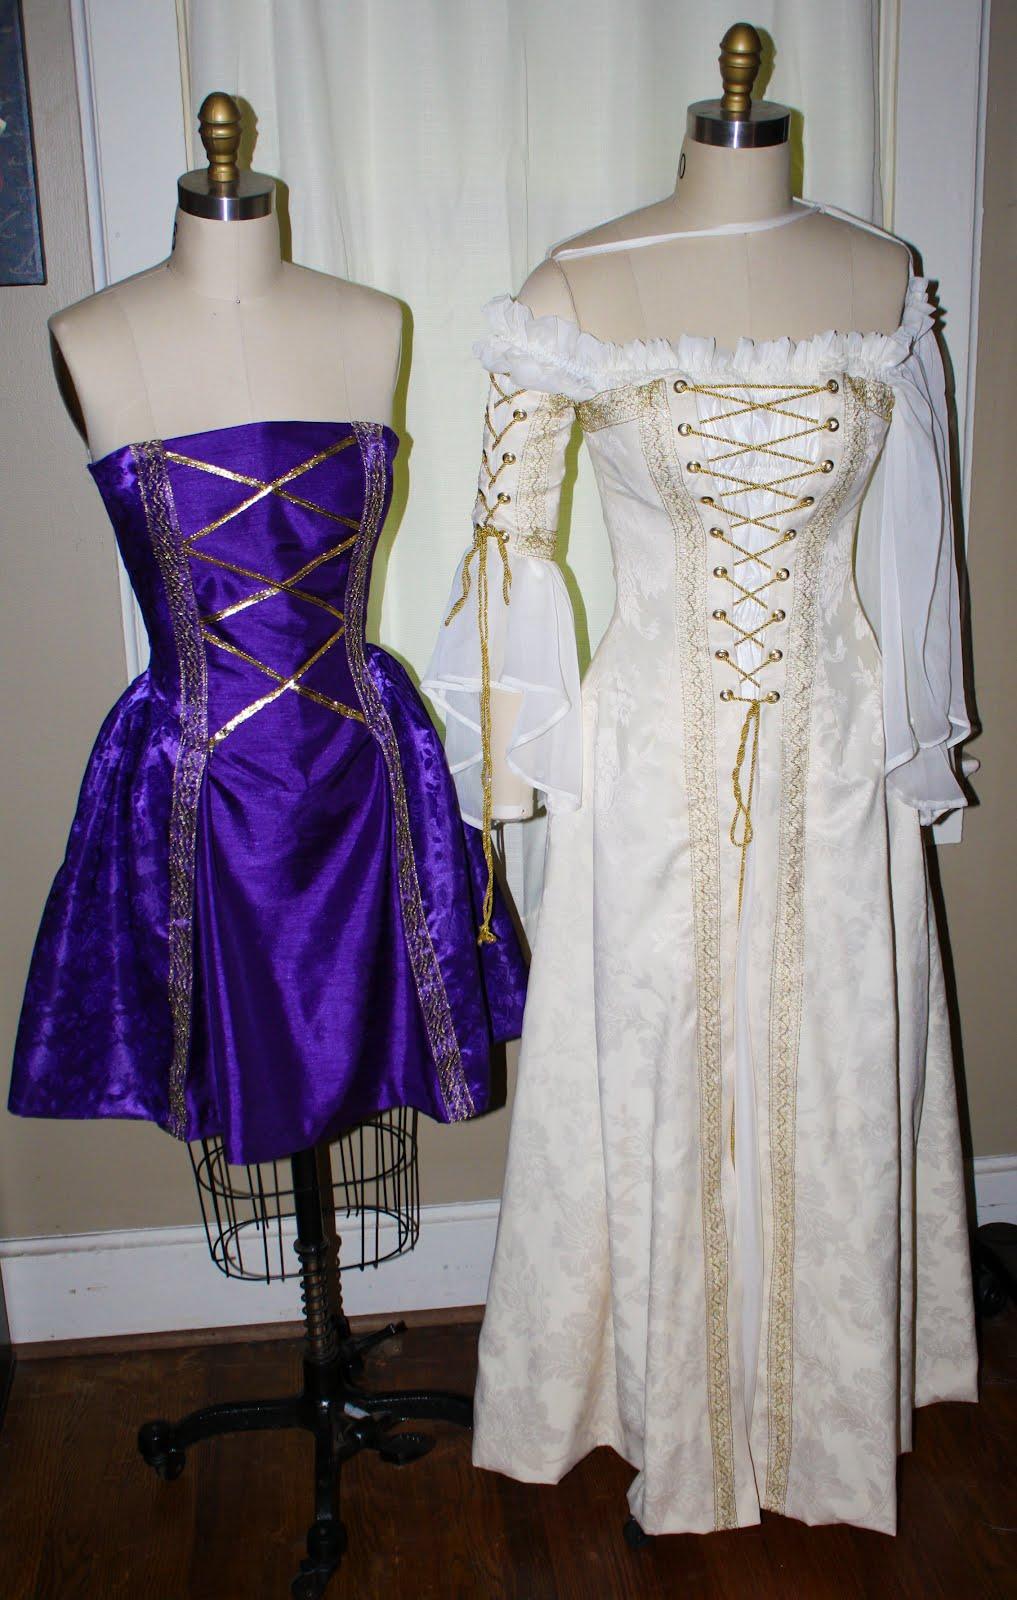 Morningstar Pinup: Renaissance Wedding Gown & Bridesmaids Dresses